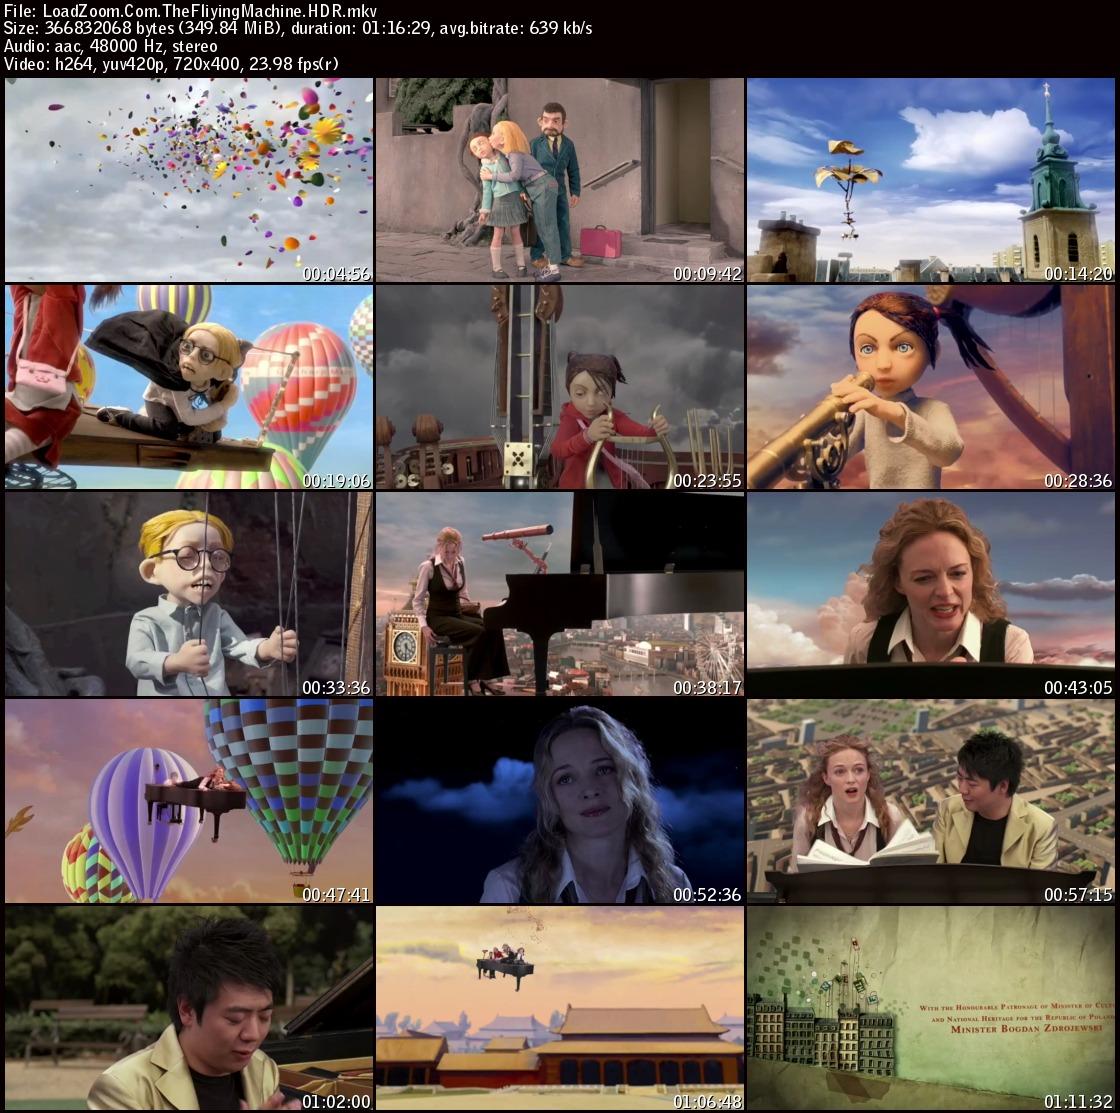 movie screenshot of The Flying Machine fdmovie.com